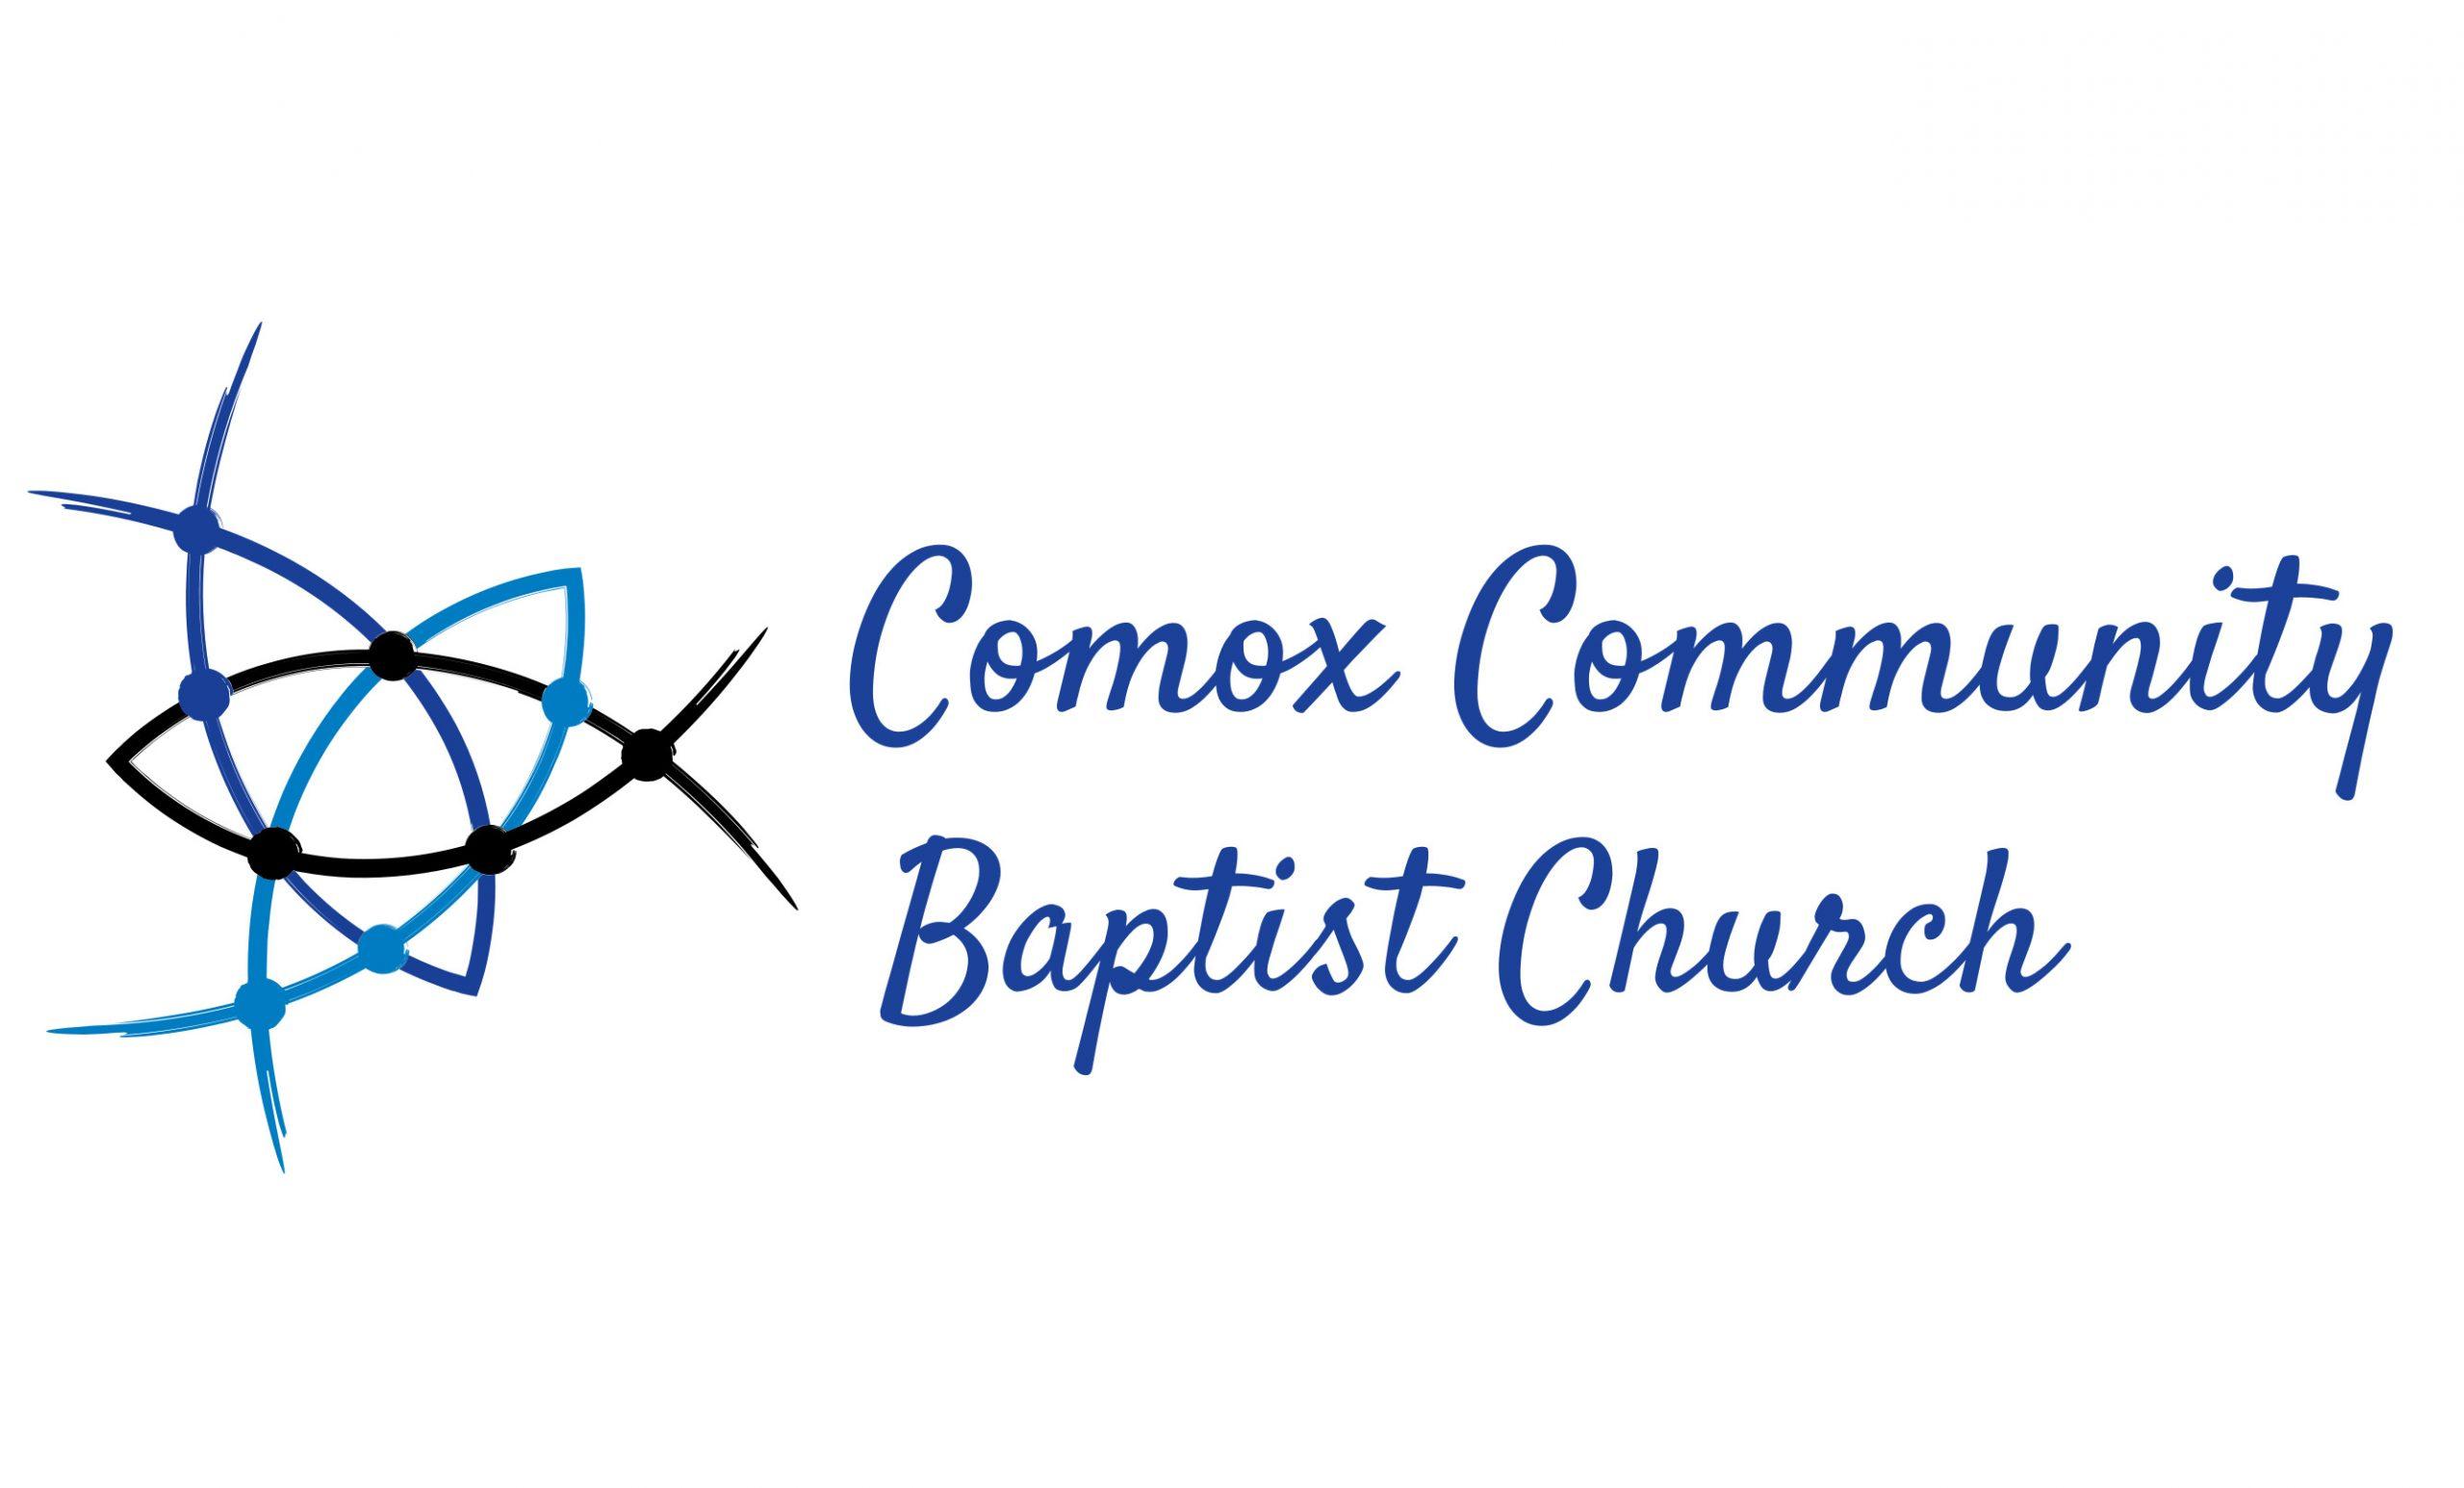 Comox Community Baptist Church